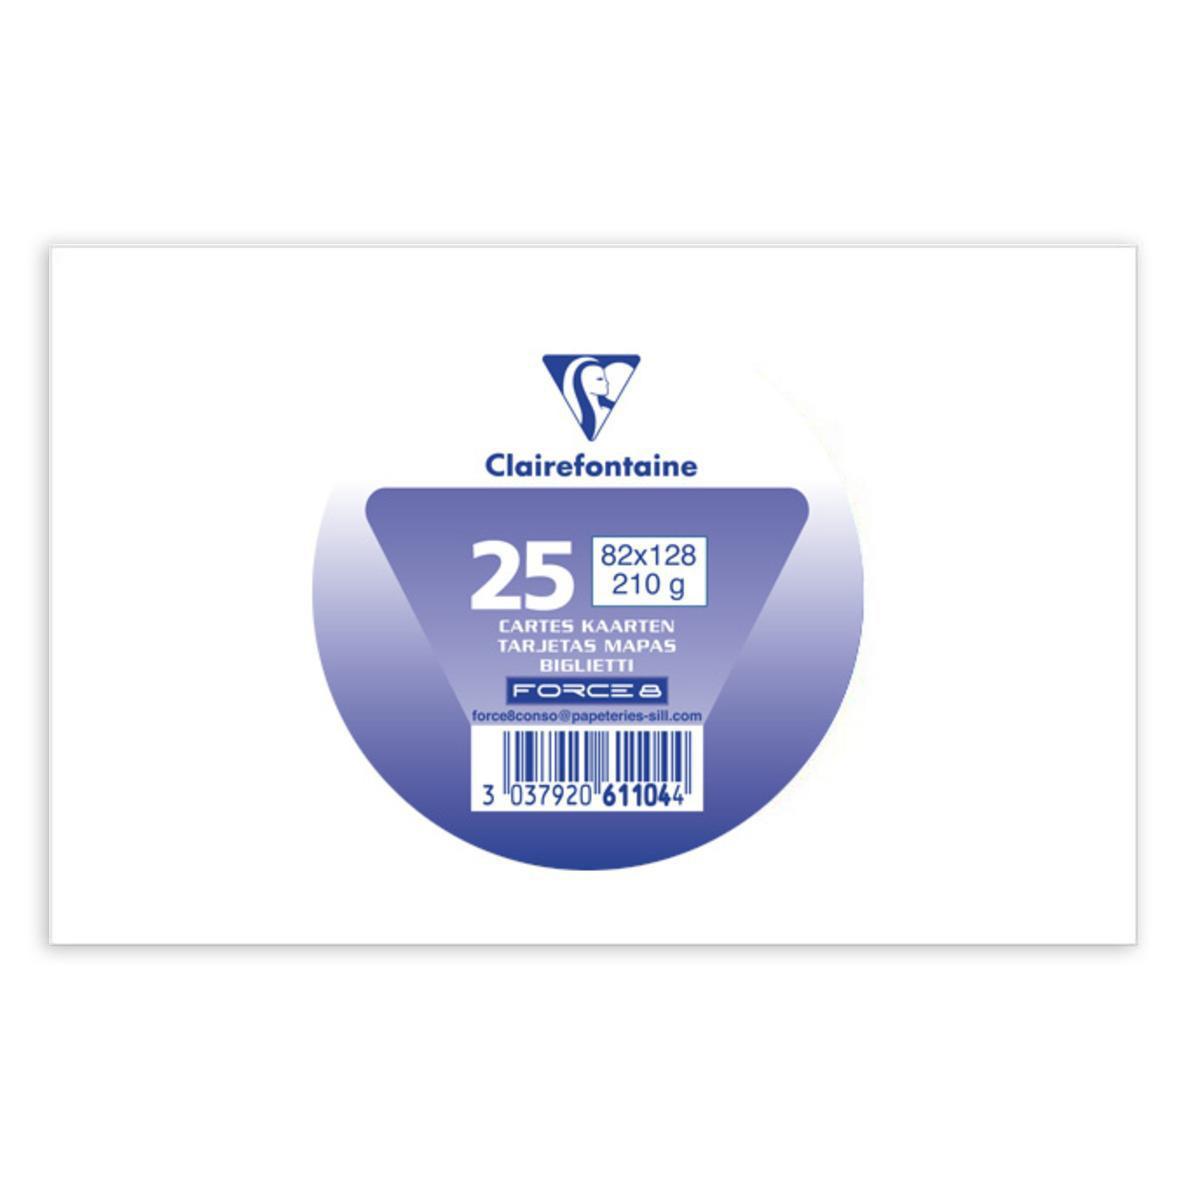 Clairefontaine 25 Cartes De Visite Blanches Dimensions 82 X 128 Mm